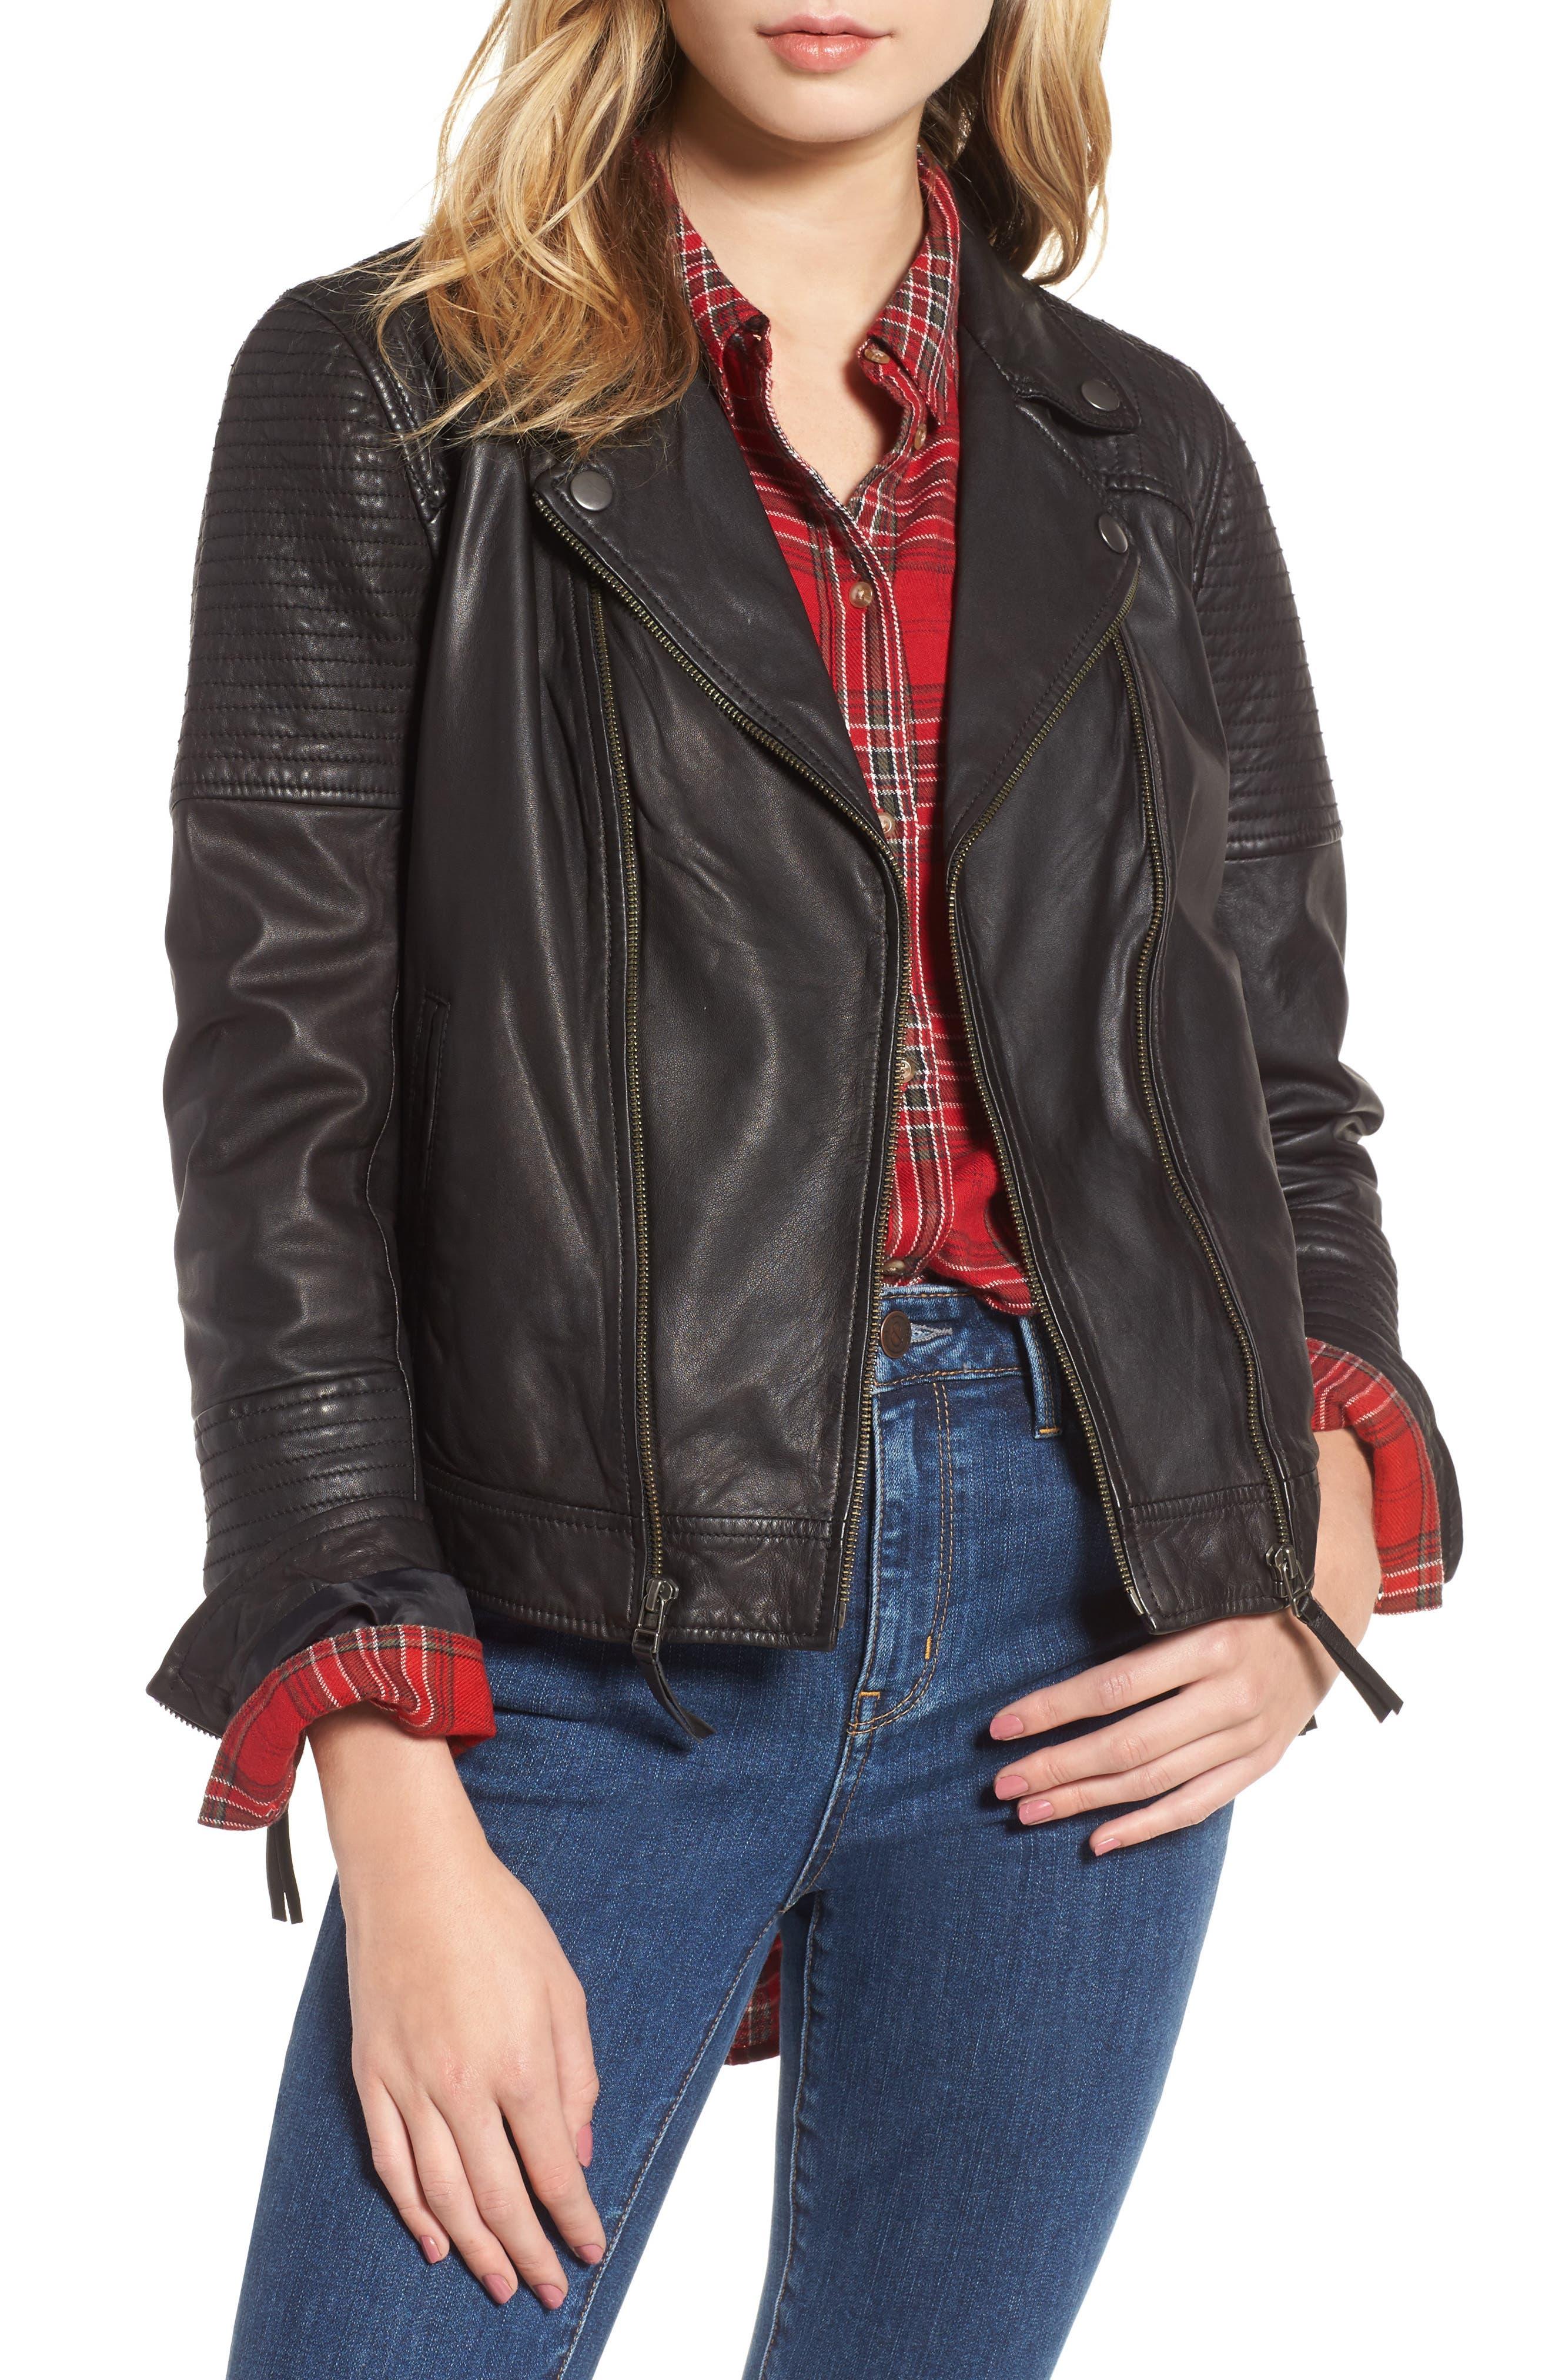 Treasure & Bond Quilted Leather Moto Jacket